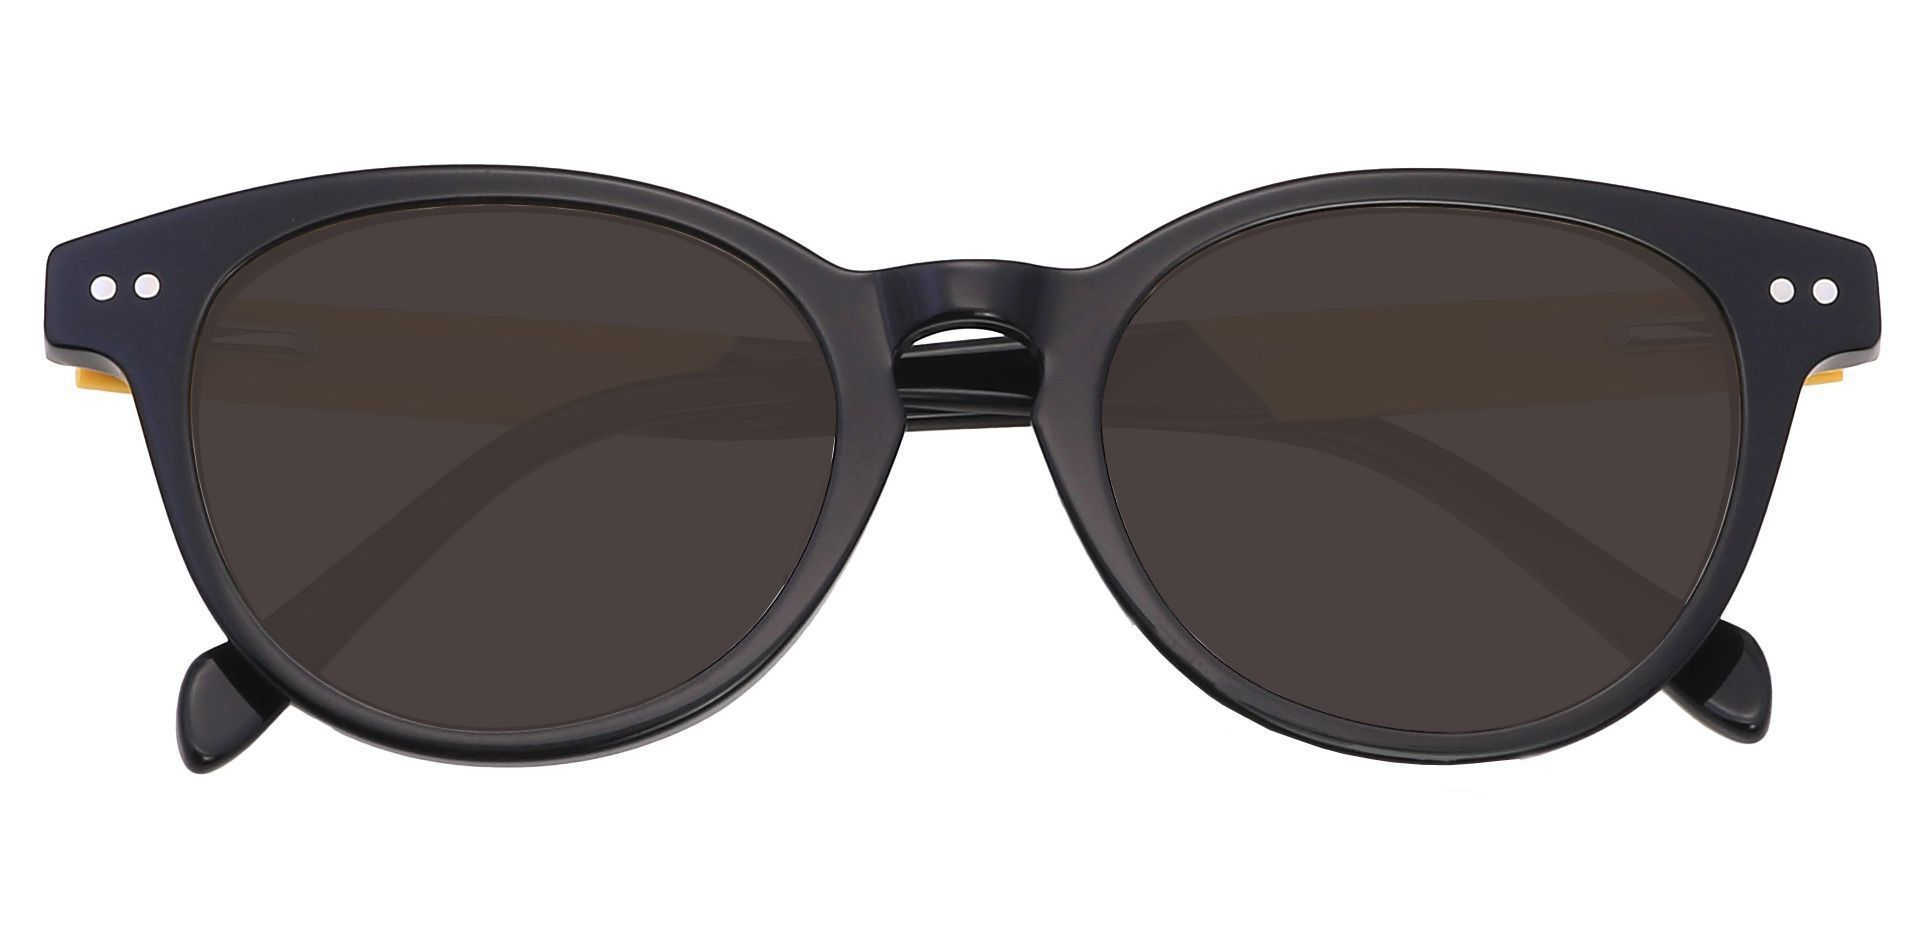 Oakland Oval Prescription Sunglasses - Black Frame With Gray Lenses